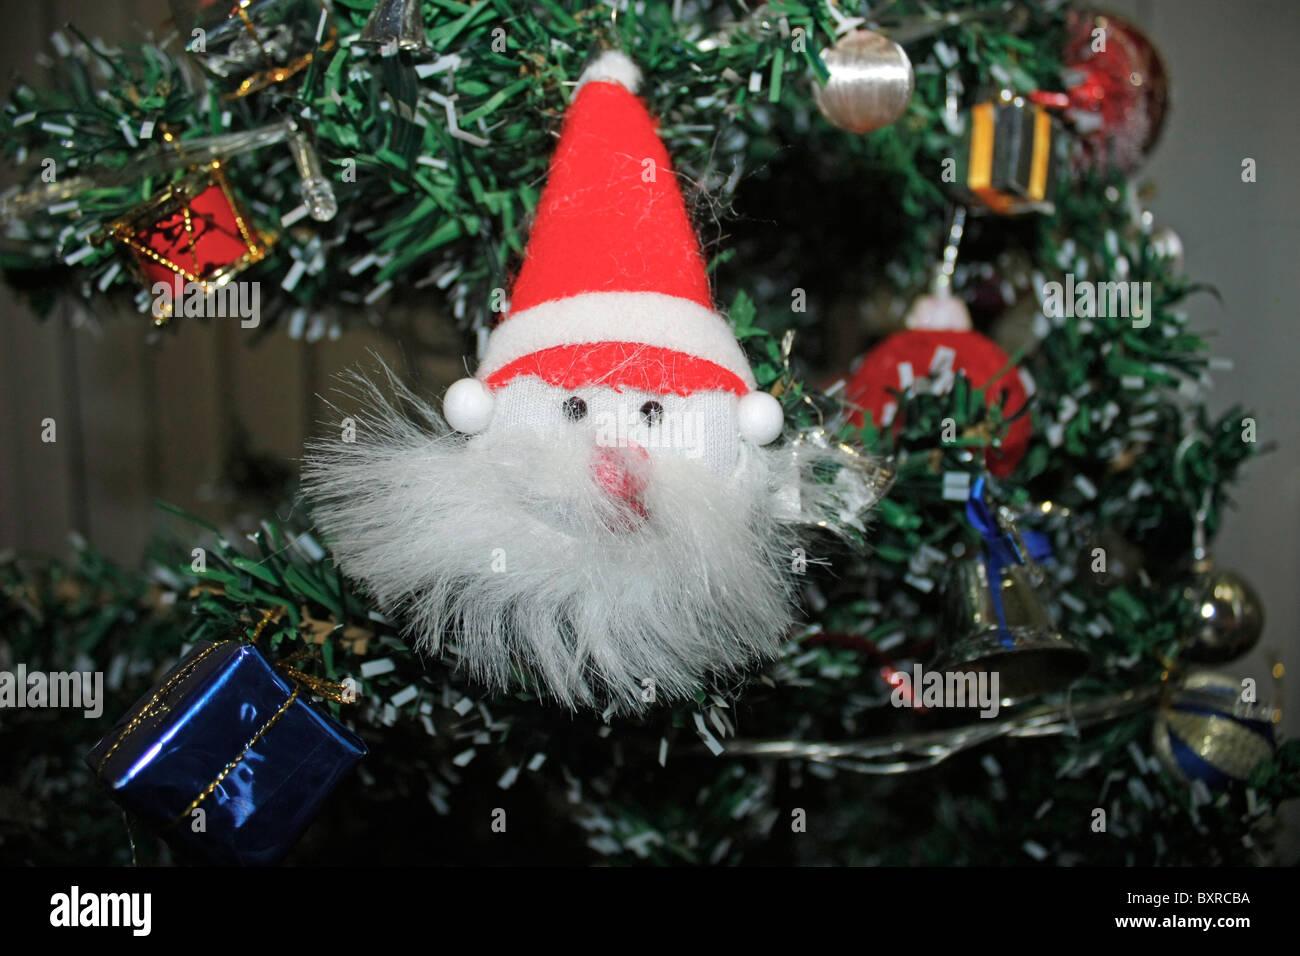 santa claus decoration item - Stock Image